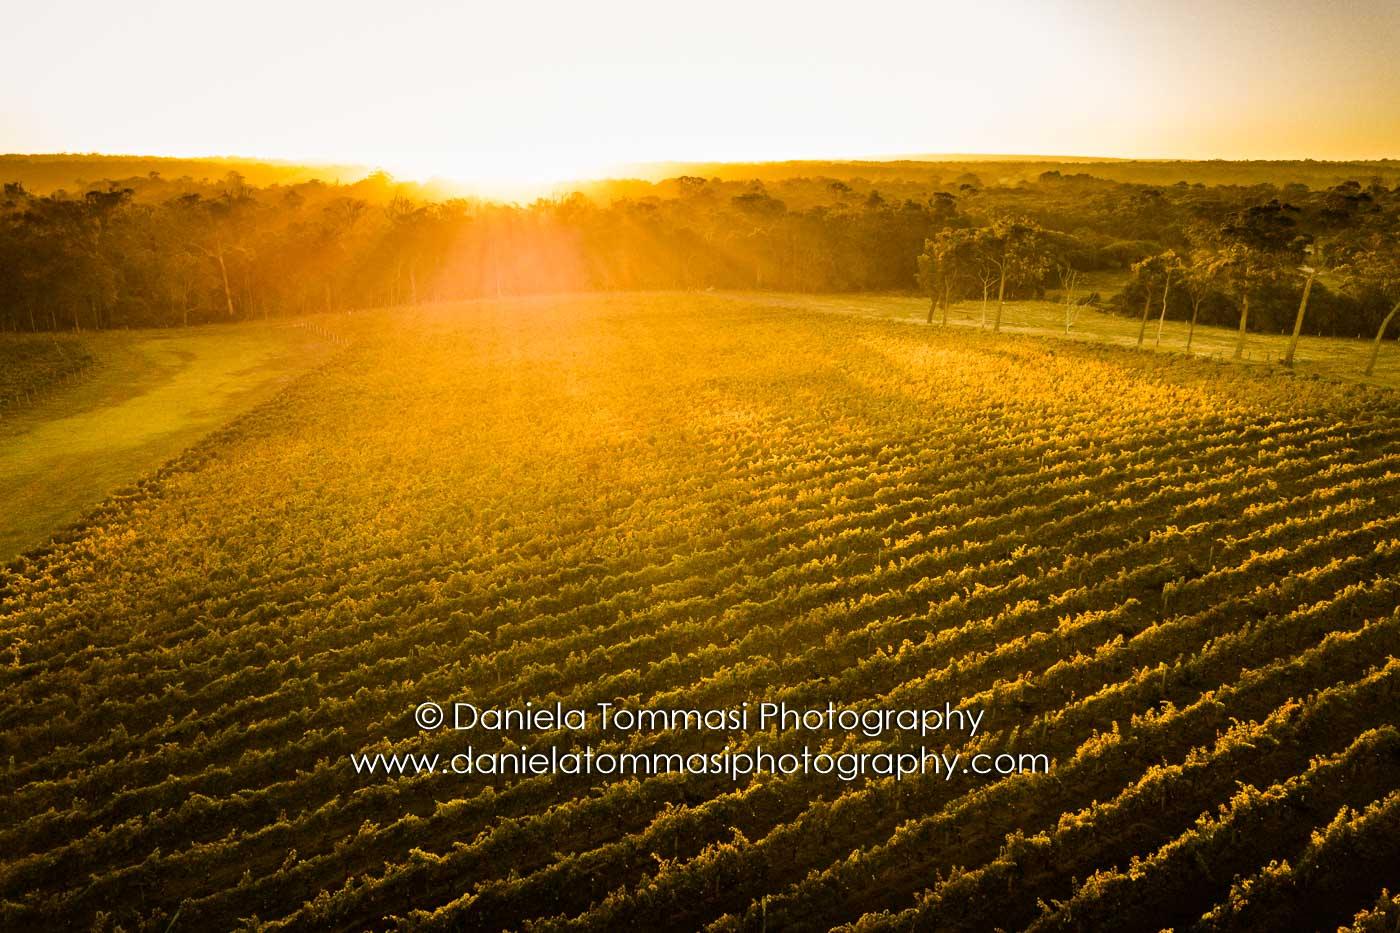 Winery-Daniela Tommasi Photography-16